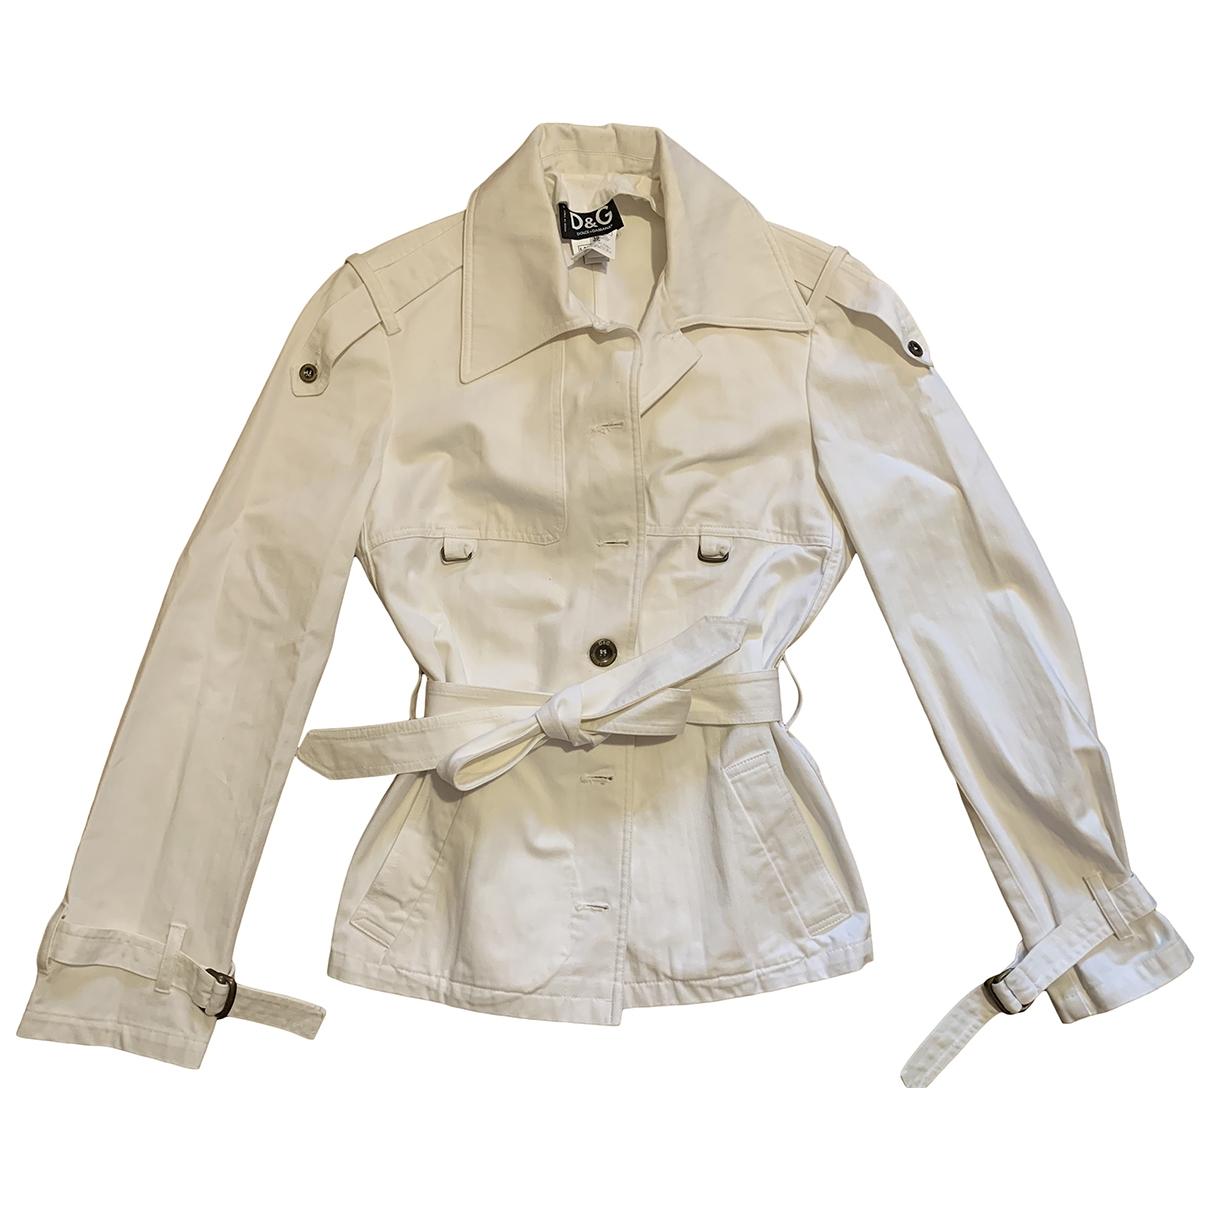 D&g \N White Cotton jacket for Women 44 IT